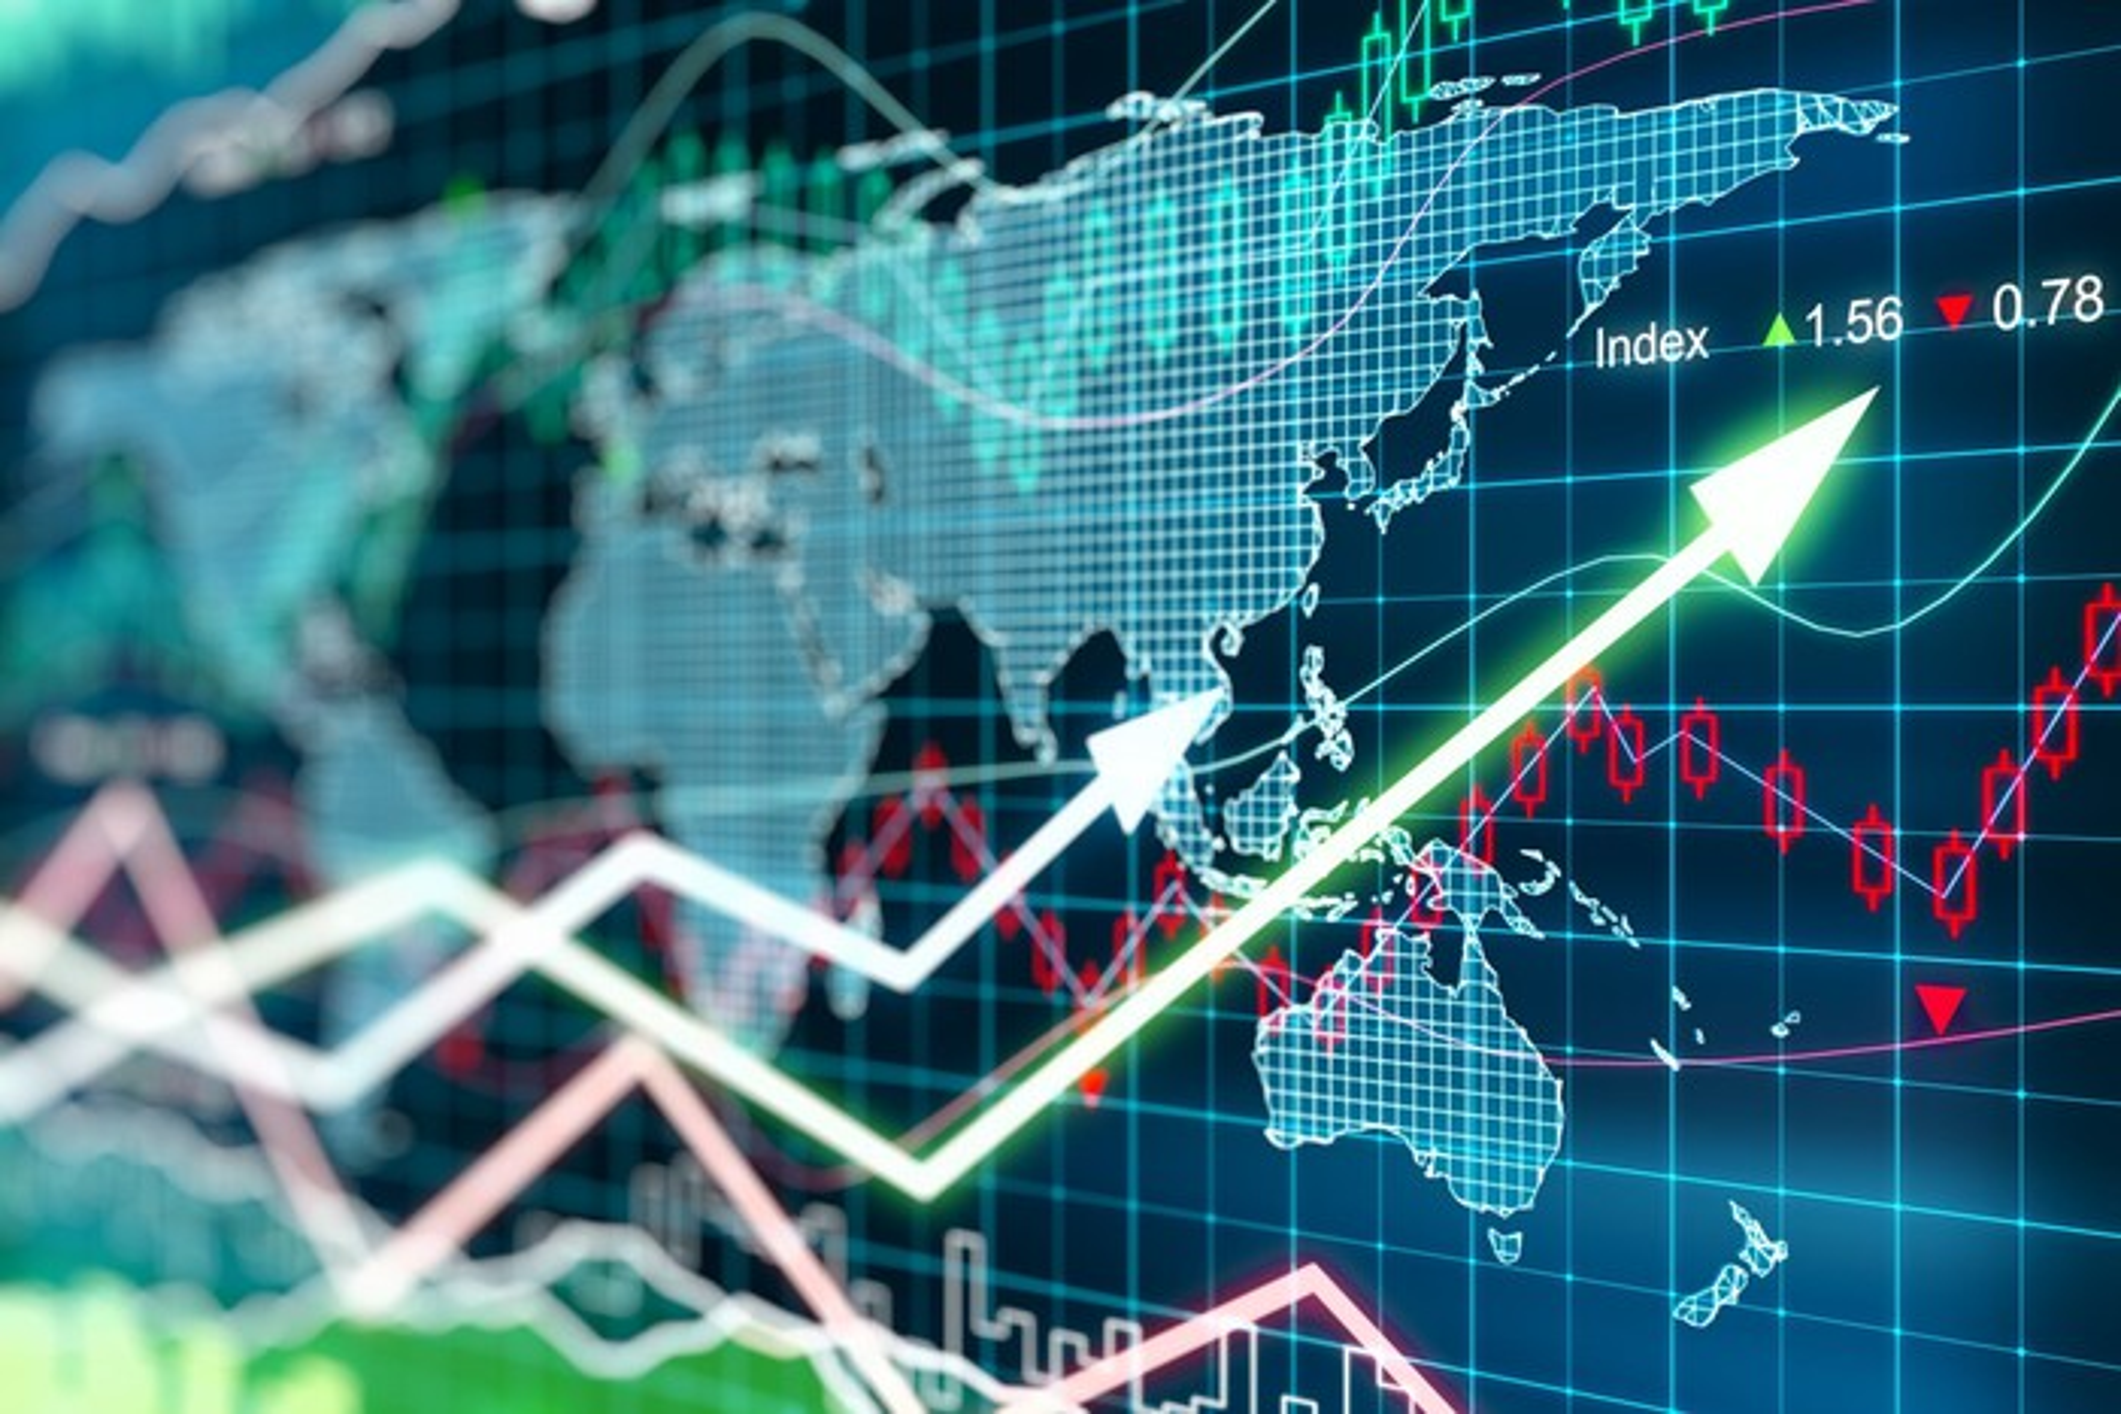 Stock market data overlaying a world map